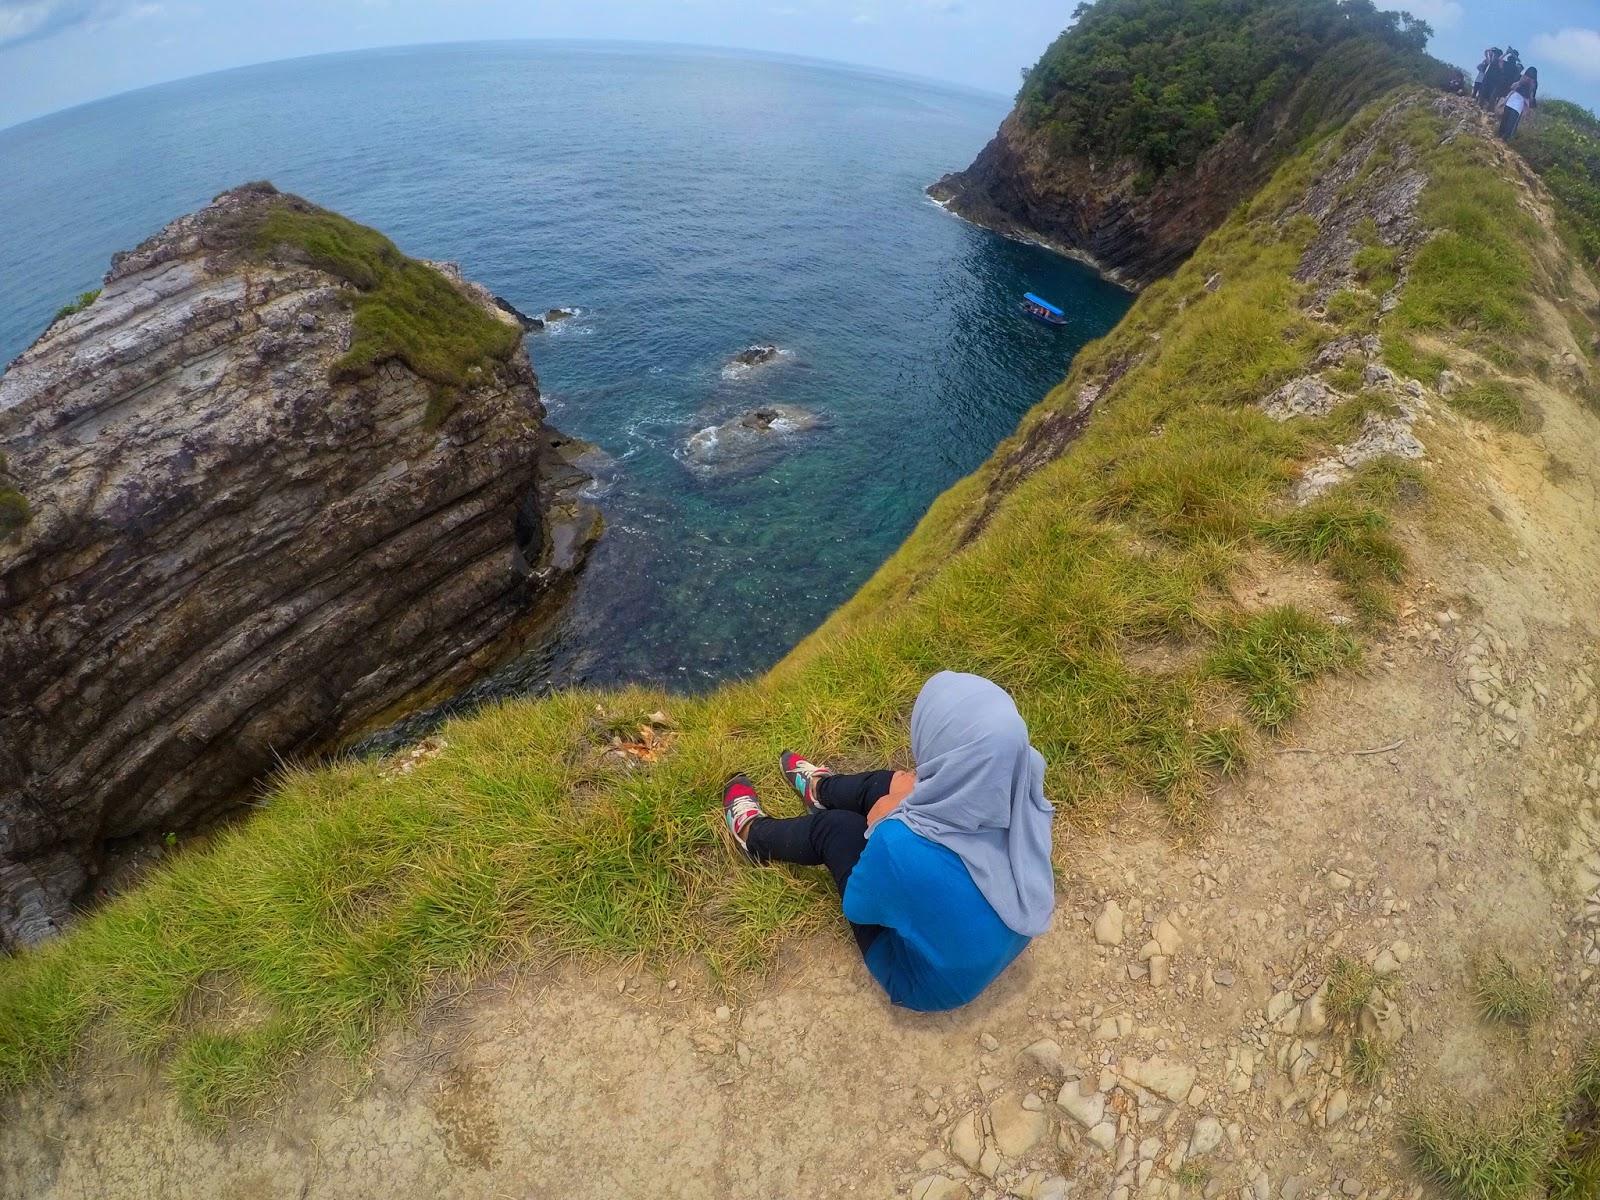 10 Aktiviti Tempat Menarik Di U Kapas Terengganu Salam Dah Agak Lama Sebenarnya Uzu Tak Ke Ni Rasa Rindu Yang Sangat Menebal Actually